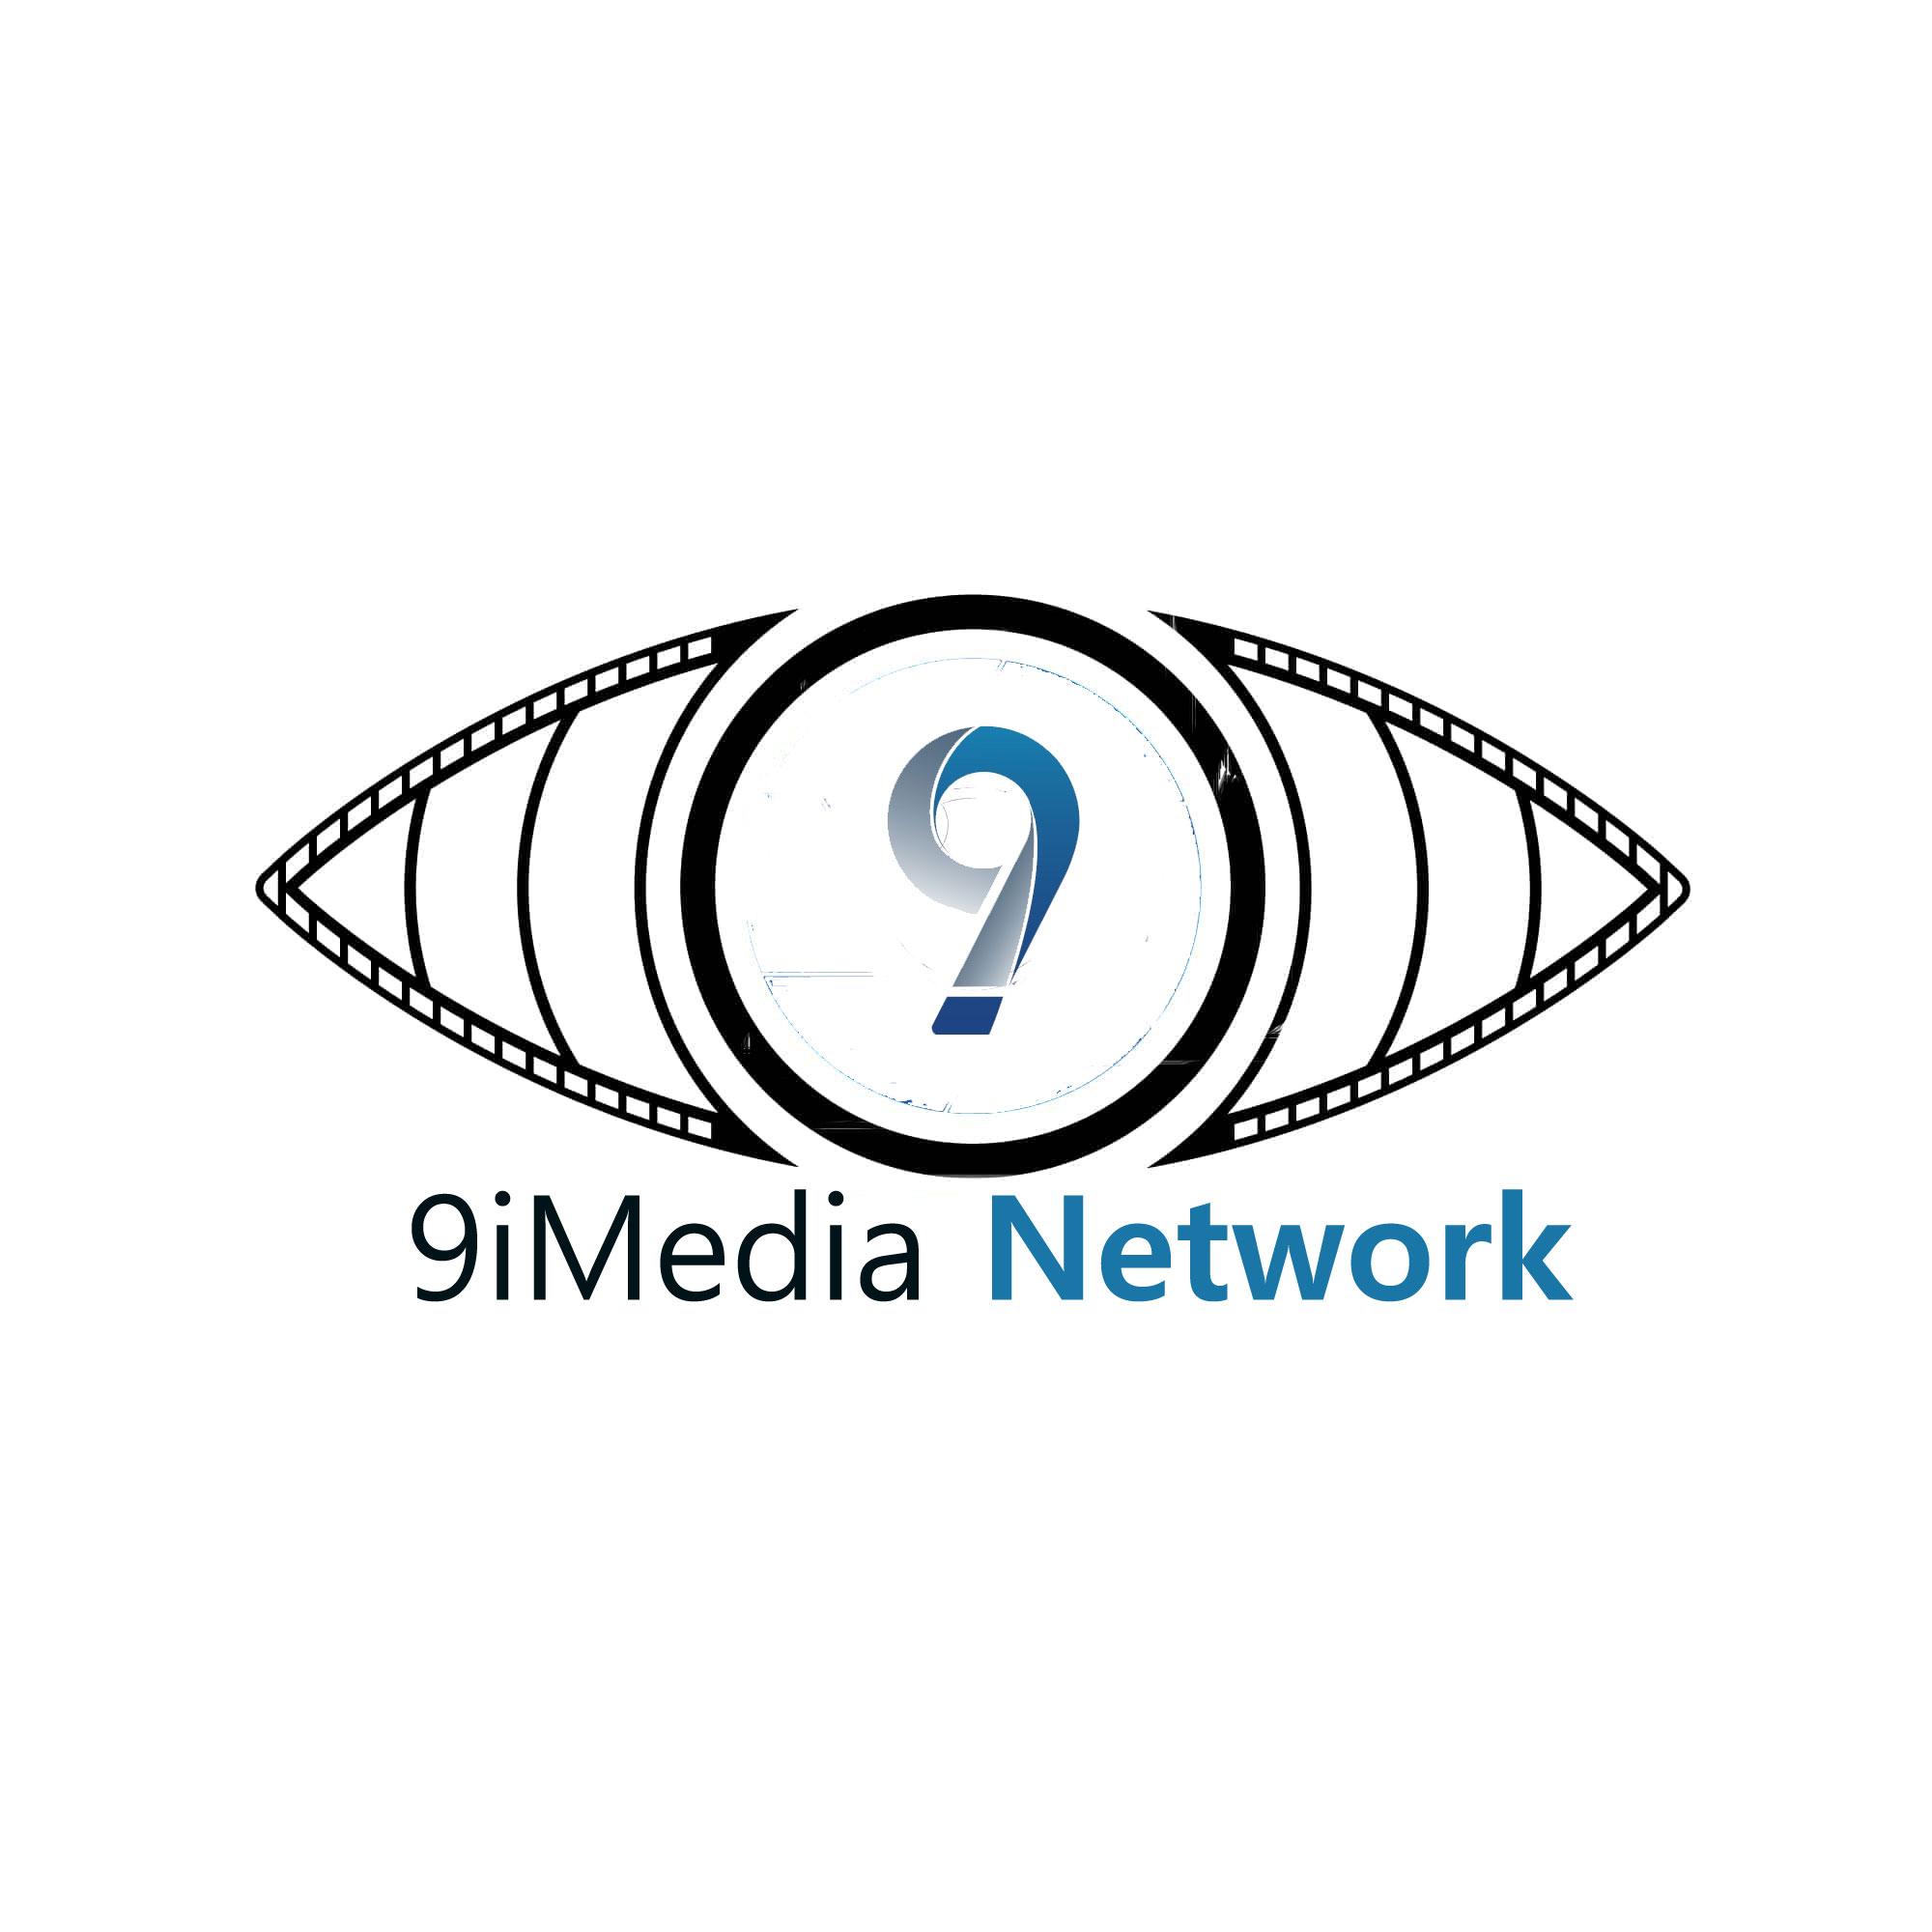 9imedia Network-UAEplusplus.com